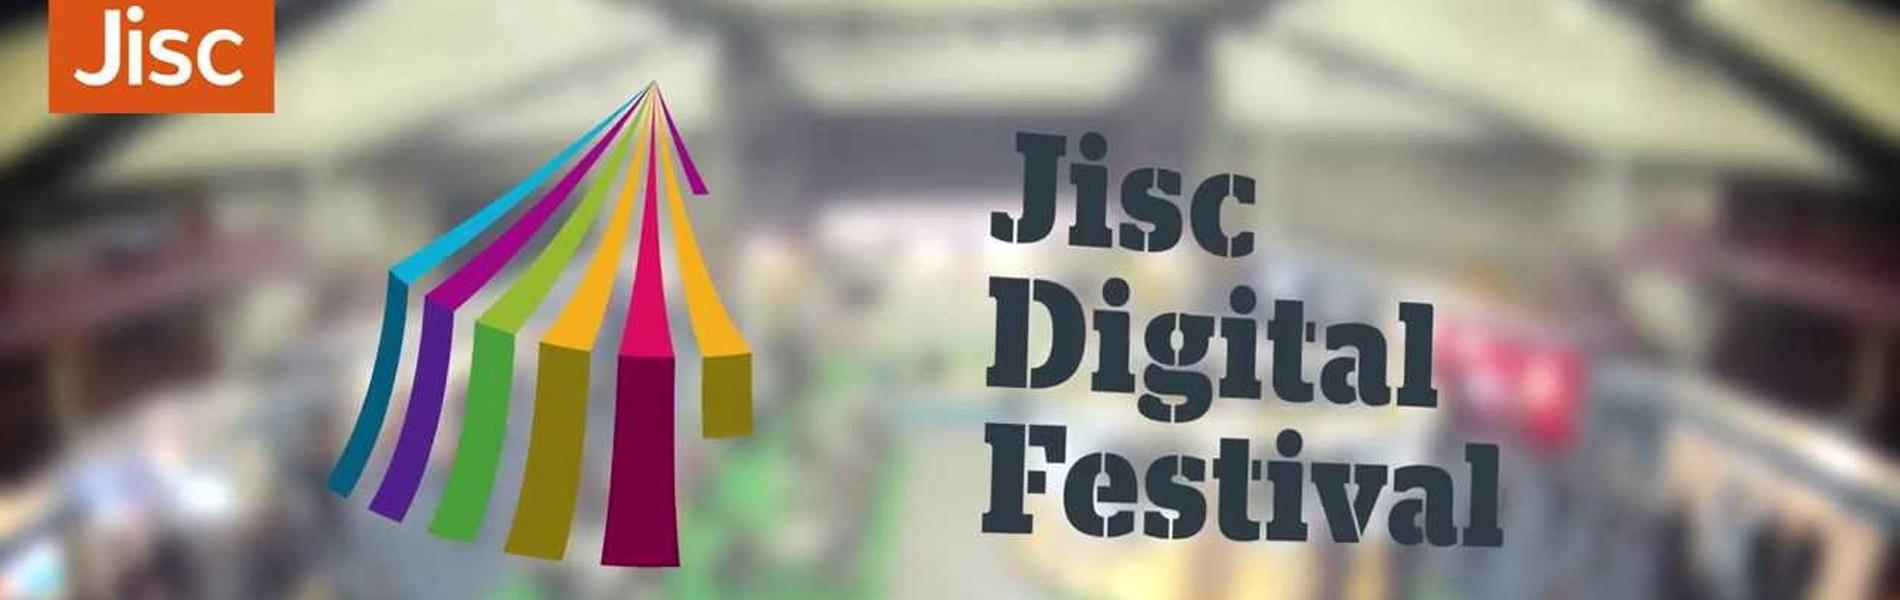 Simpson Associates showcase Power BI at the Jisc Digital Festival 2014